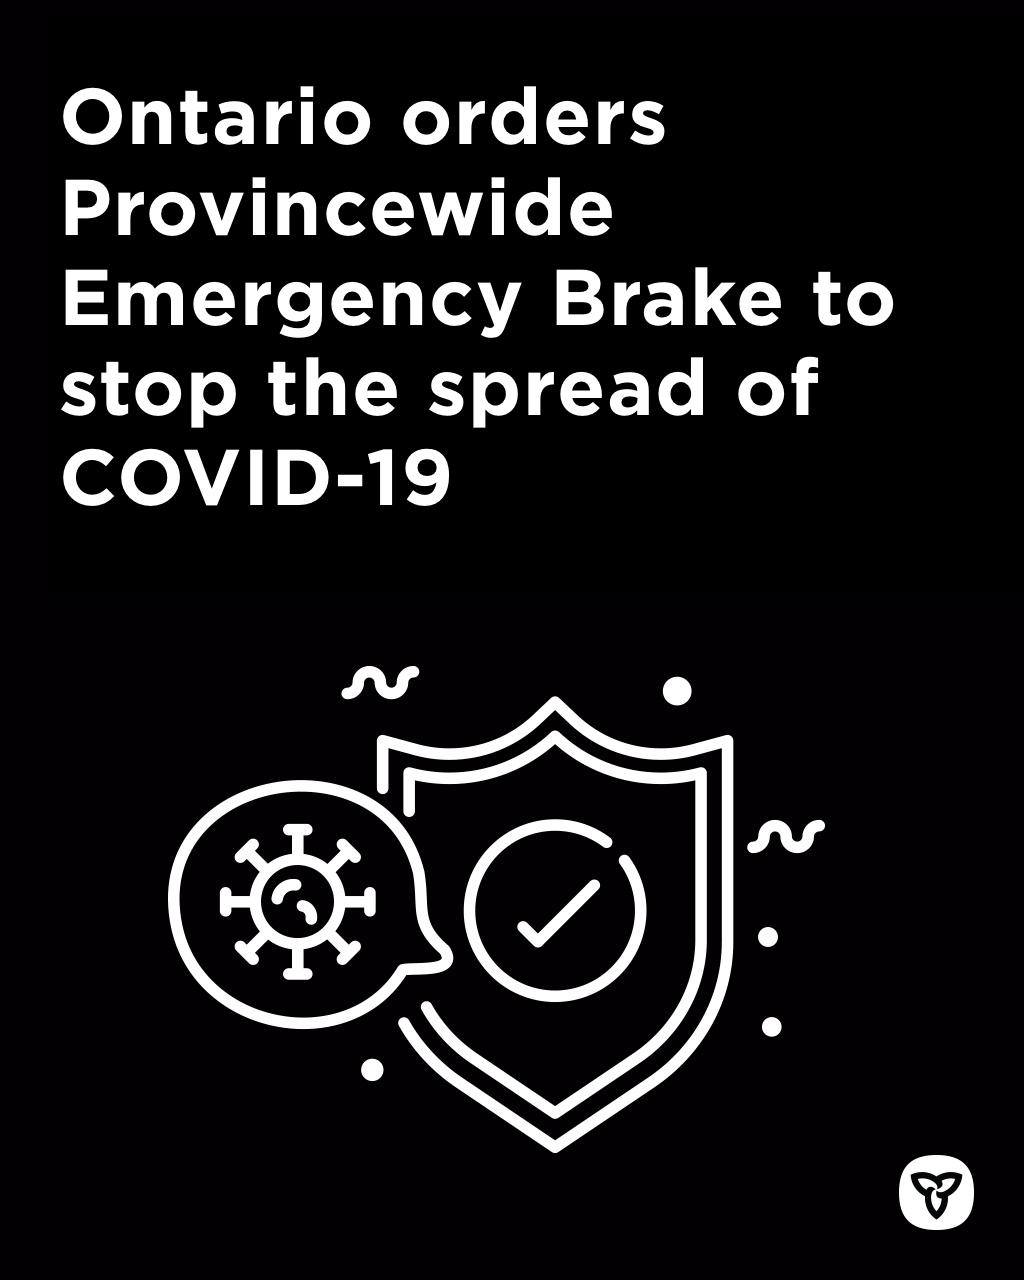 Ontario Implements Provincewide Emergency Brake